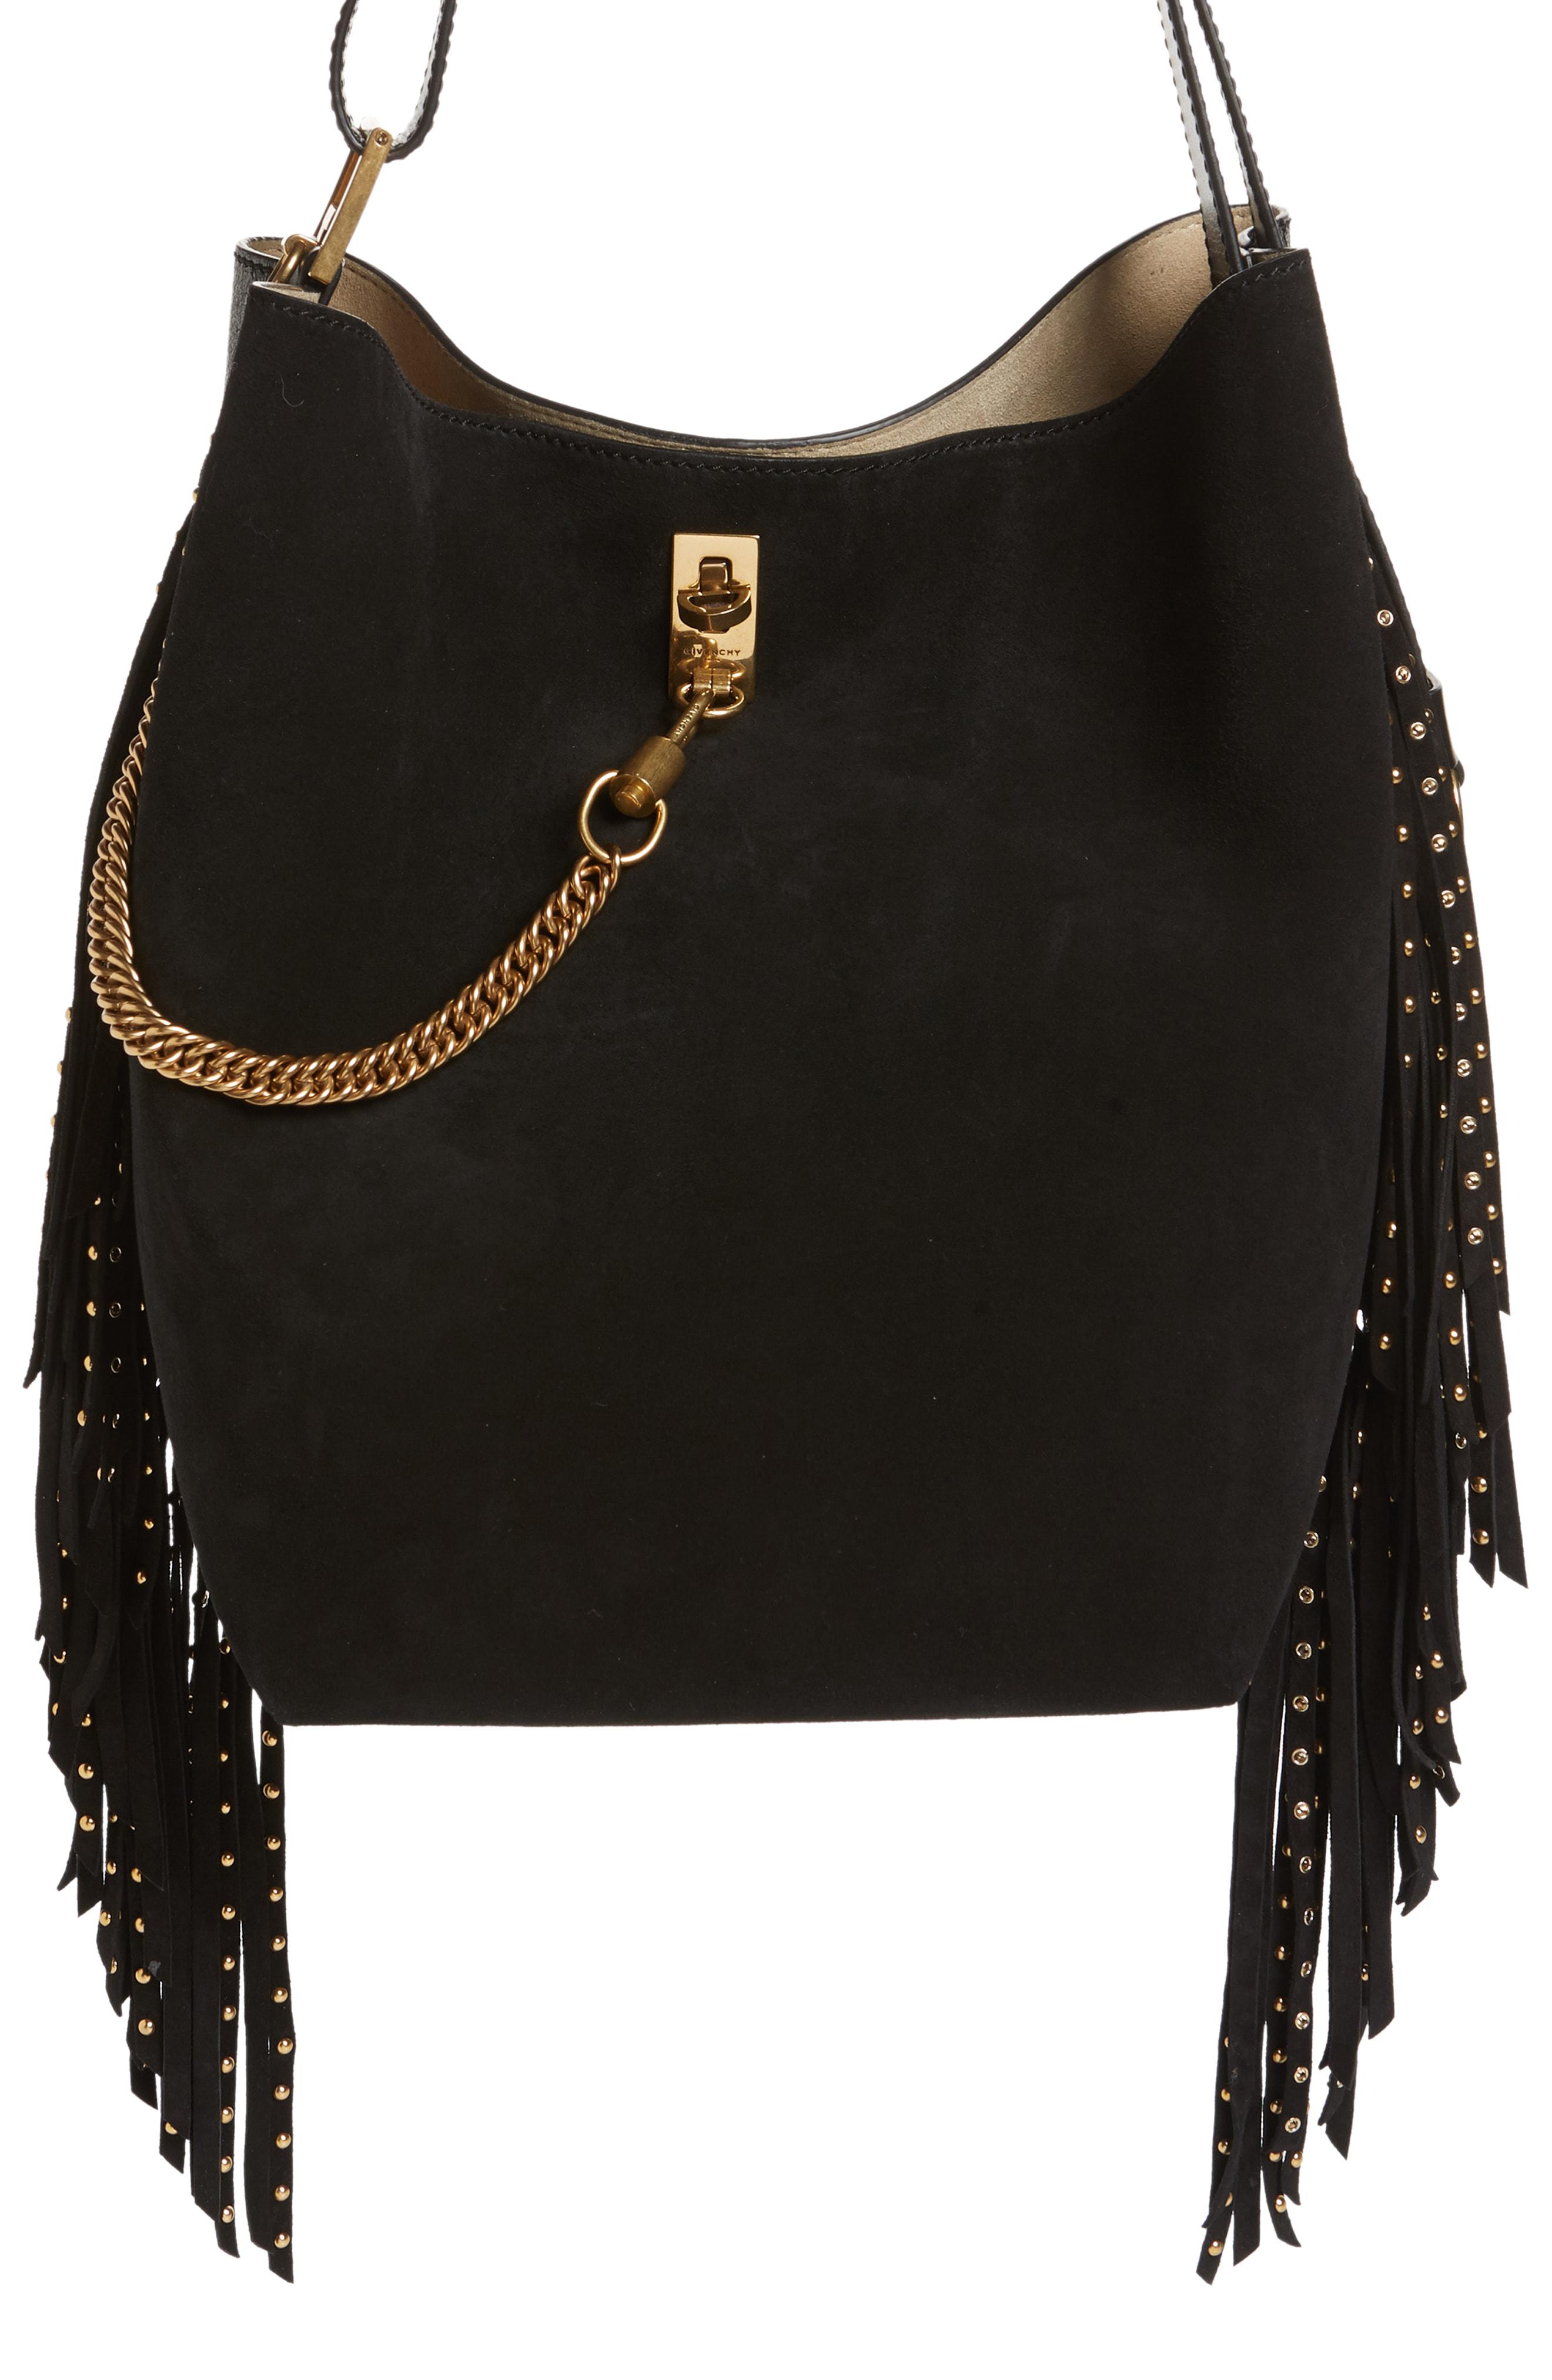 1a68f81450 Givenchy Medium Gv Studded Fringe Calfskin Bucket Bag - Black